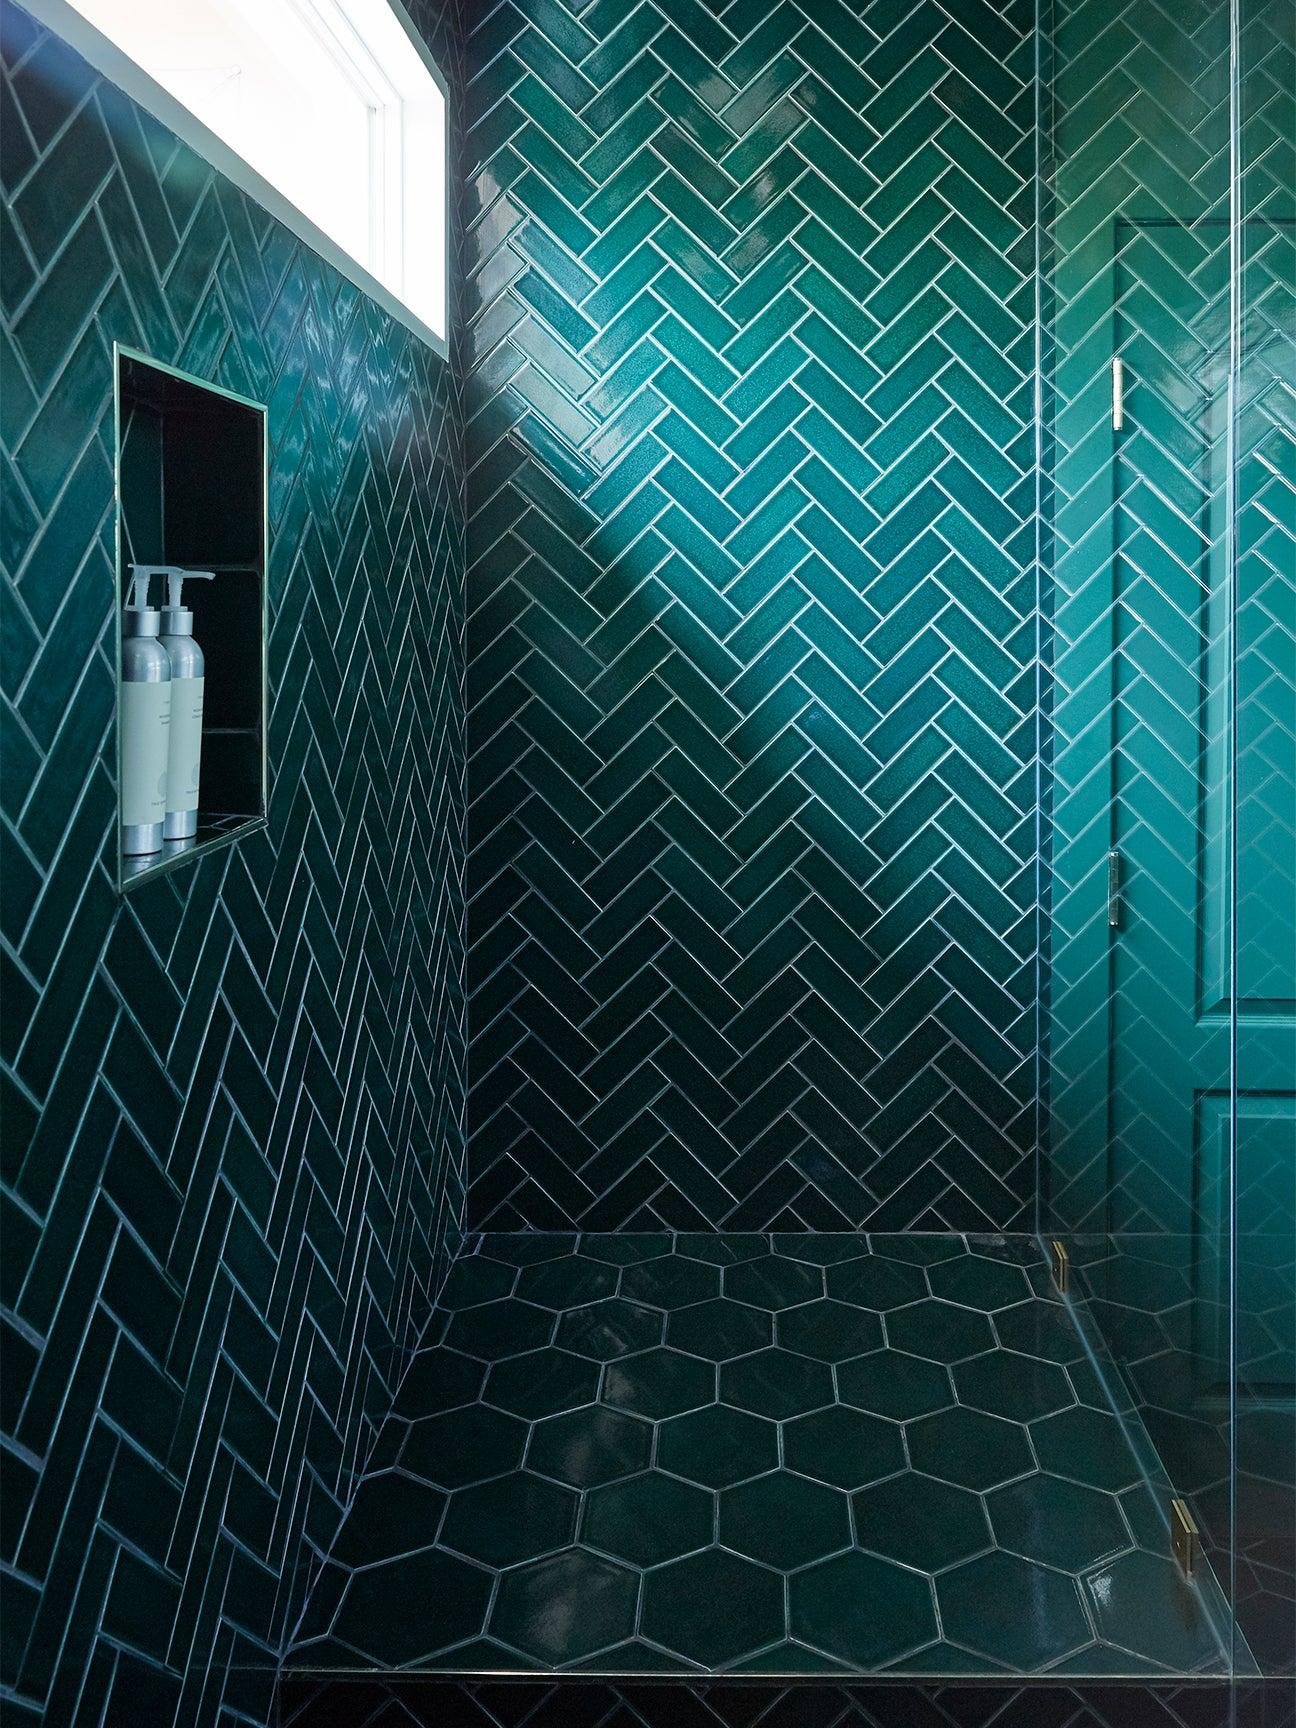 00-FEATURE-laurel-galucci-bathroom-tile-domino